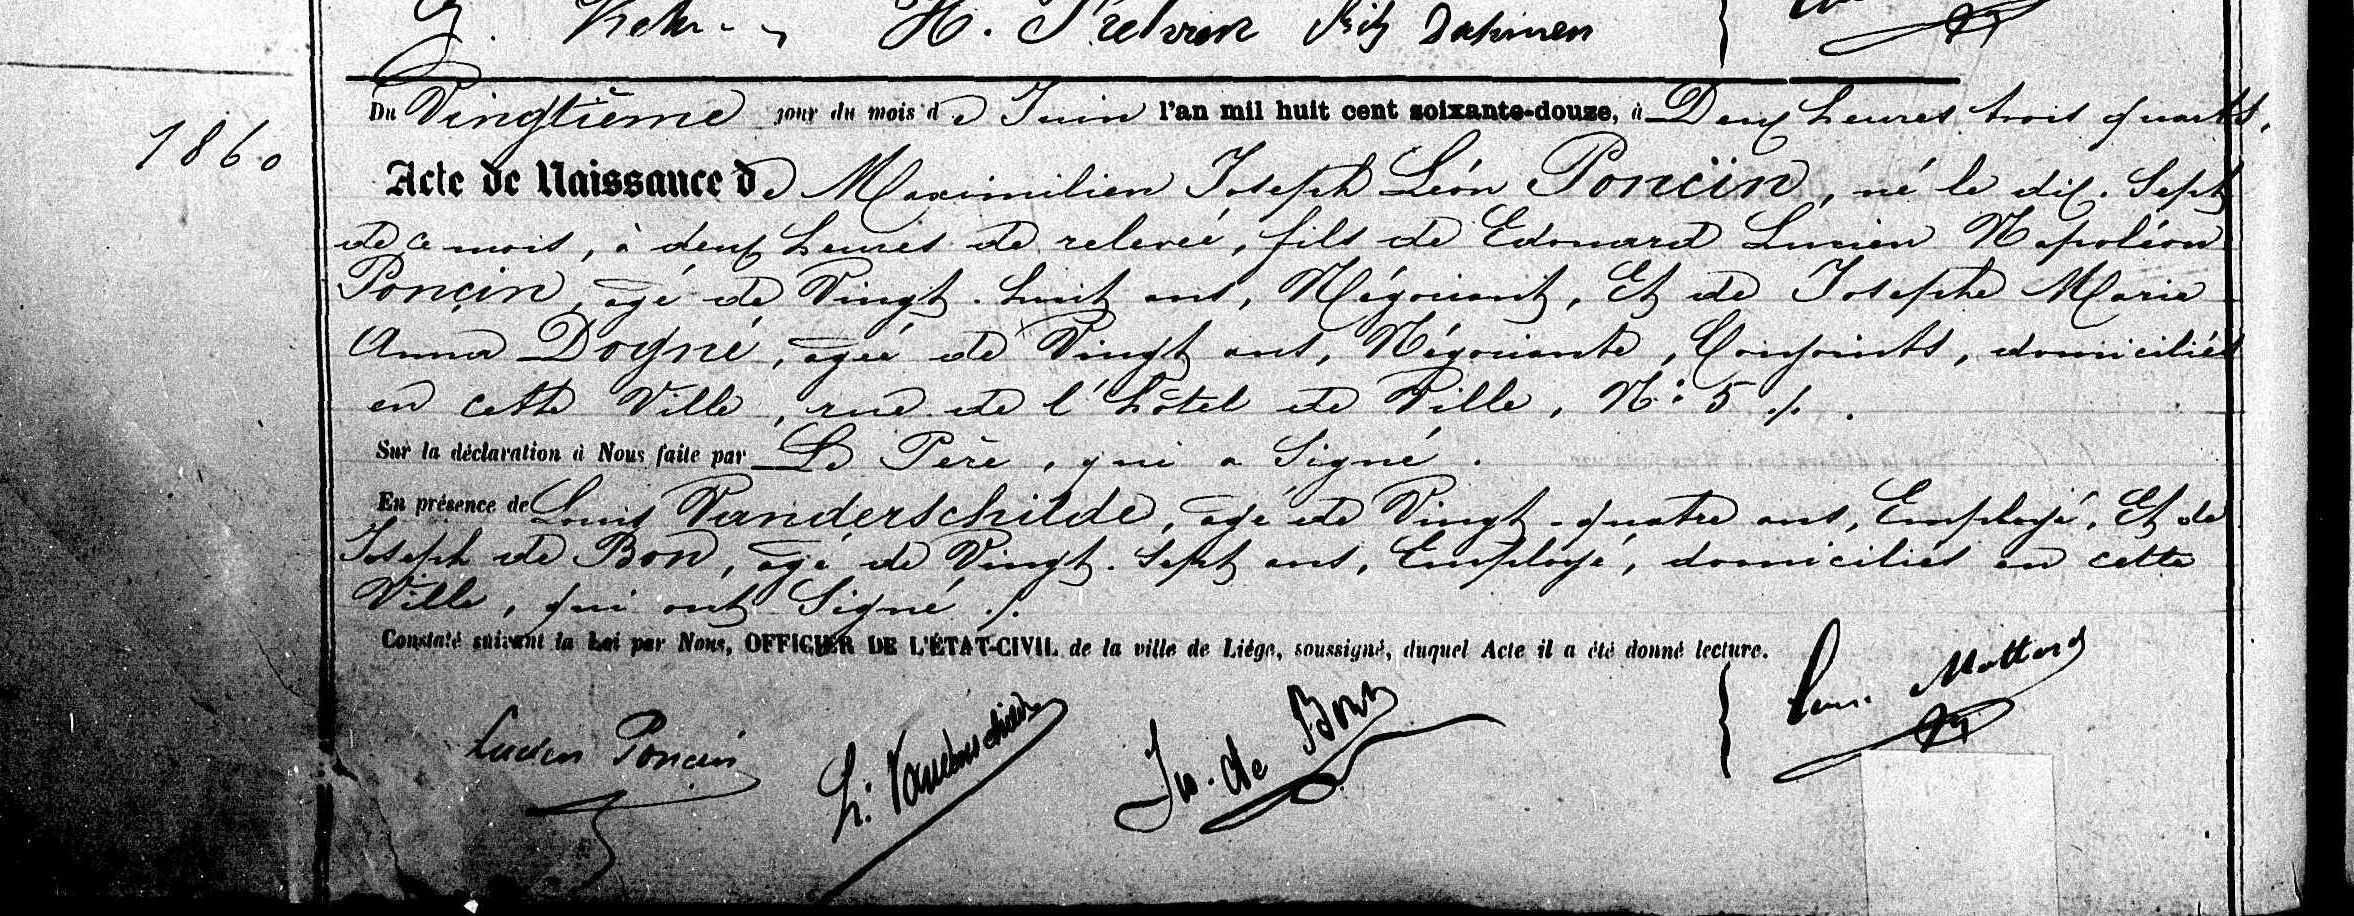 1872 Birth Certificate: Maximilien Poncin